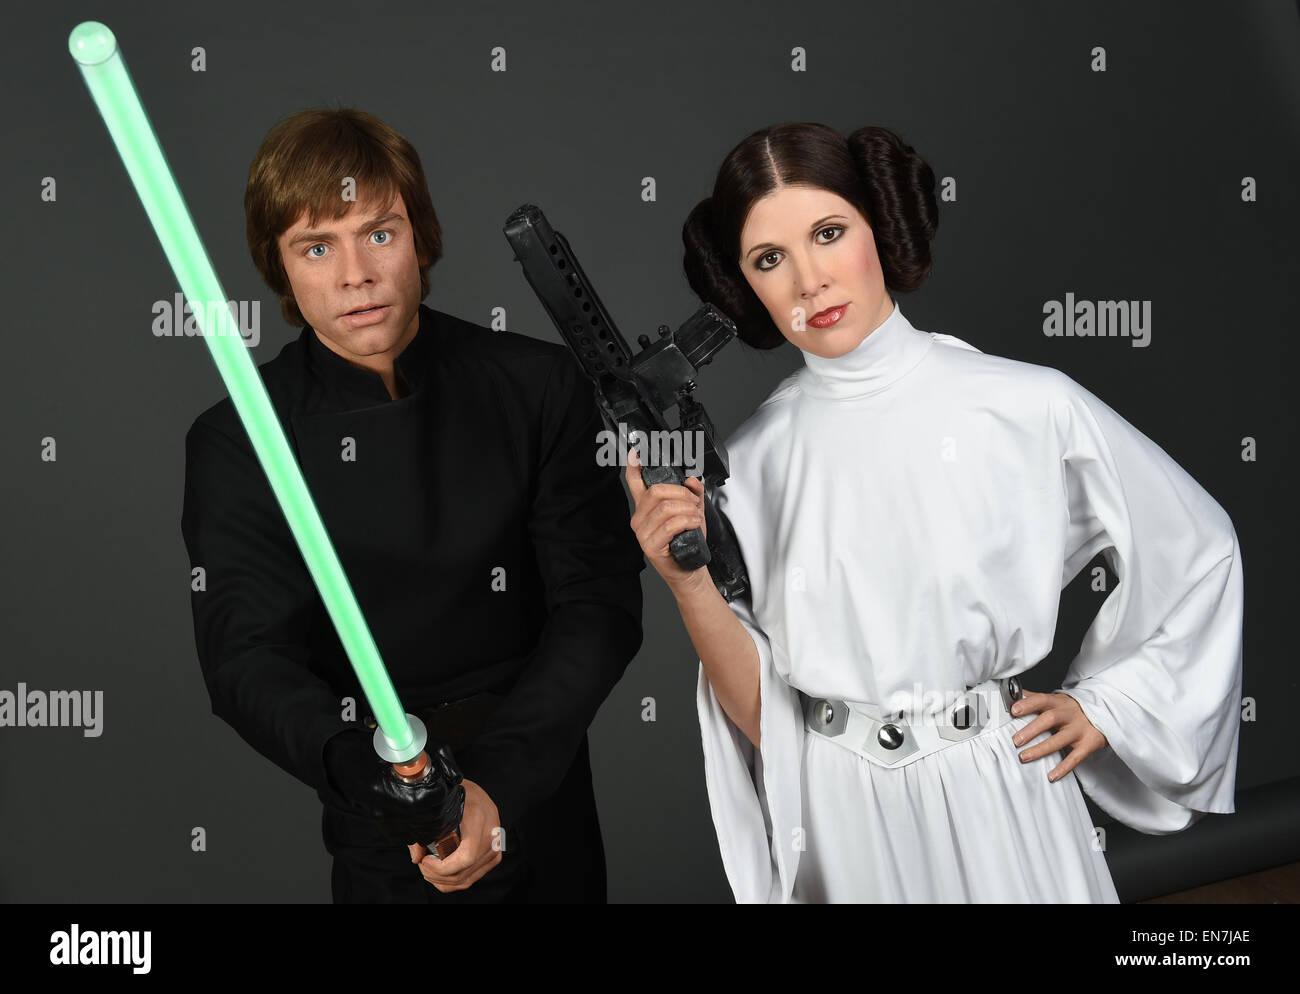 London UK. 29th Apr 2015. dpa-exclusive The wax figures  sc 1 st  Alamy & Princess Leia Stock Photos u0026 Princess Leia Stock Images - Alamy